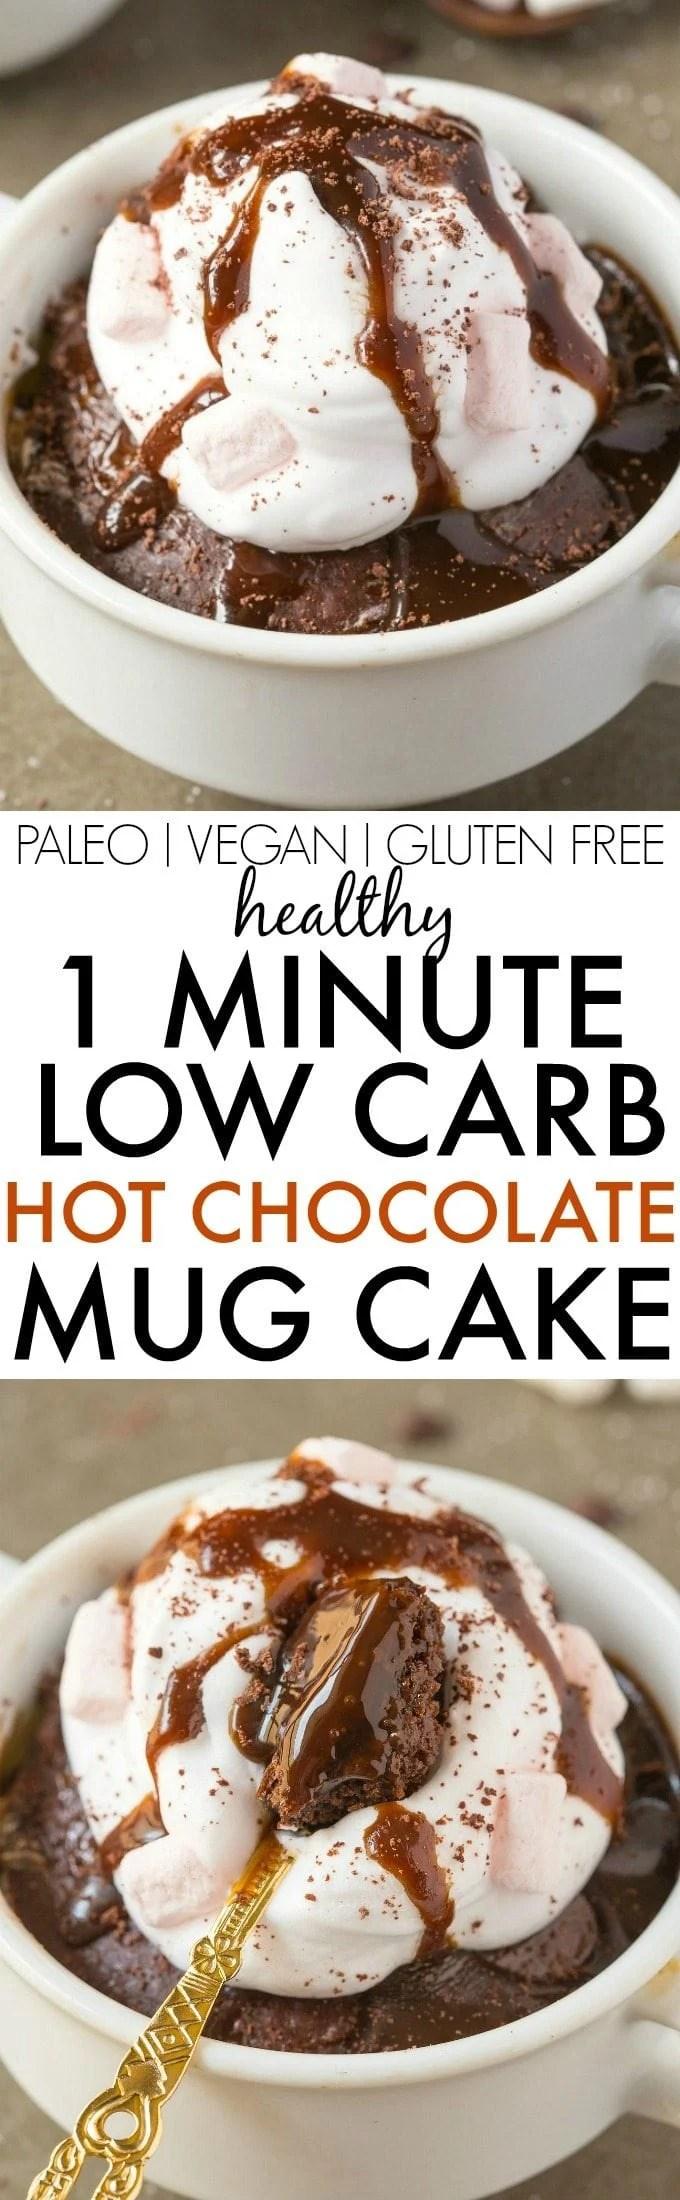 Hot Chocolate Cake In A Mug No Egg